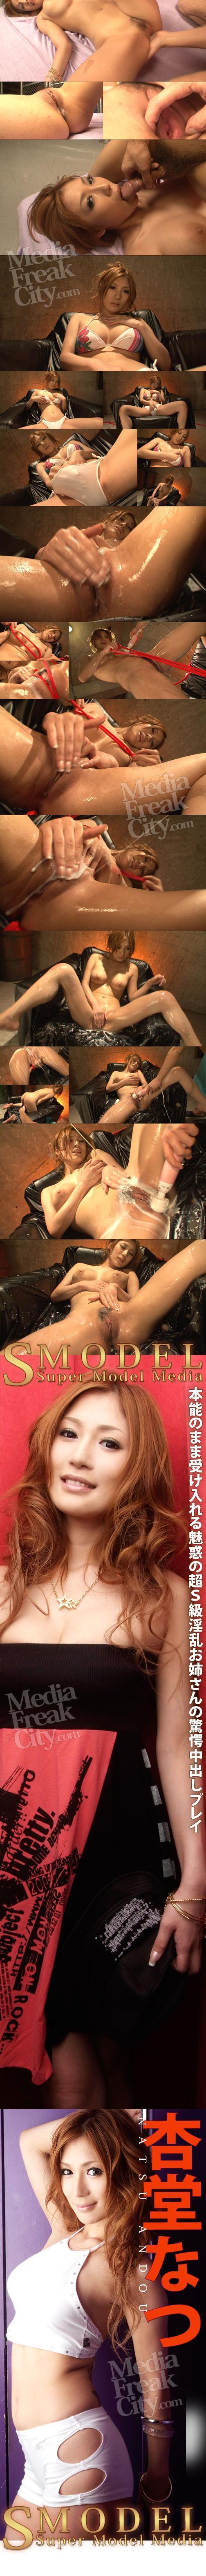 [SMD-01] S Model 01 : 杏堂なつ - image SMD-01_4 on https://javfree.me